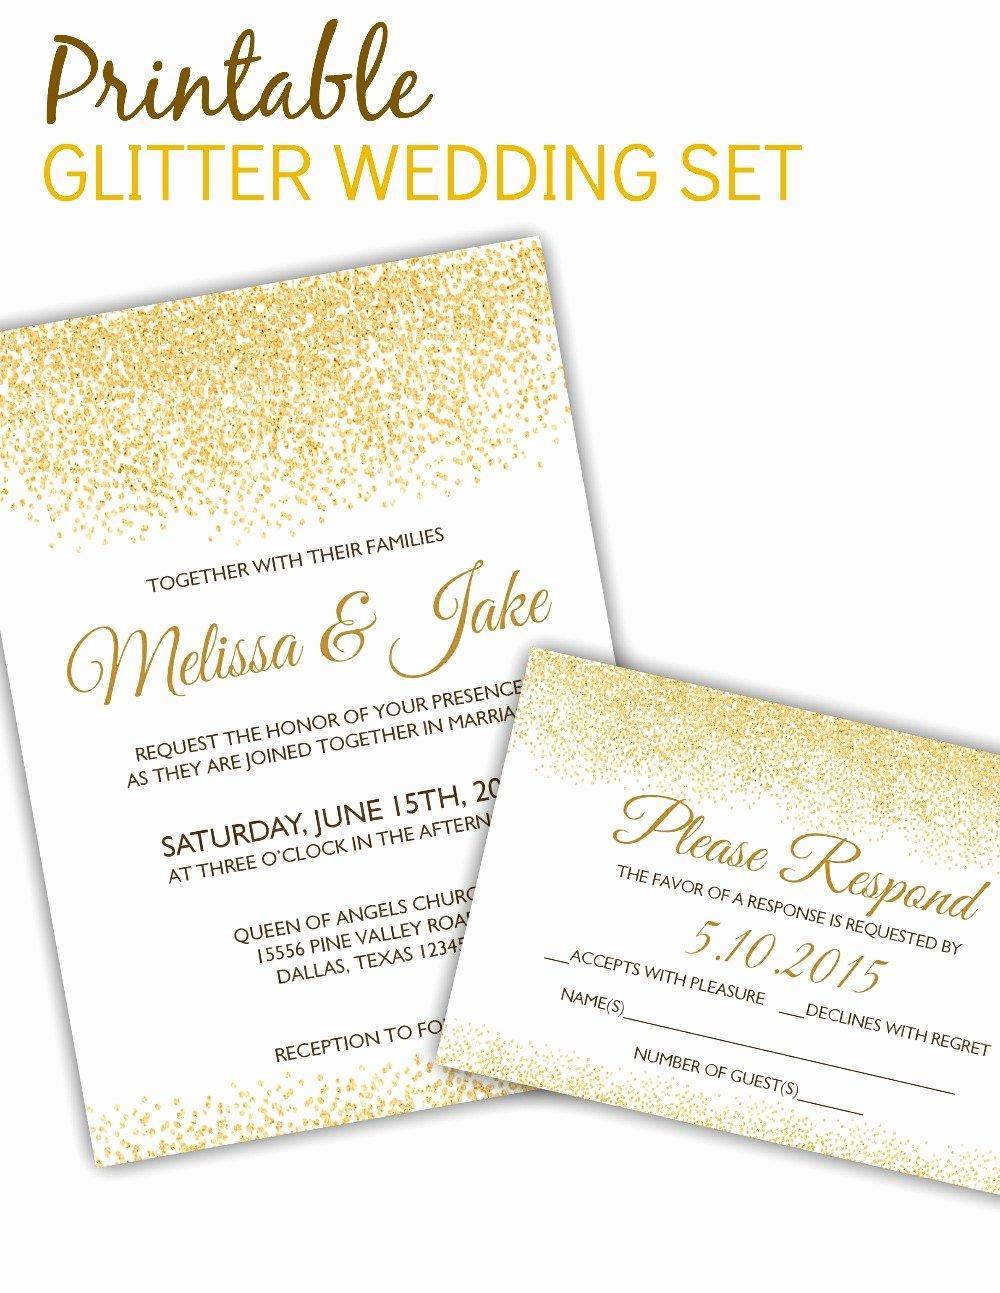 5x7 Invitation Template Word Best Of Printable Glitter Invitation & Rsvp Template Posh Pixel